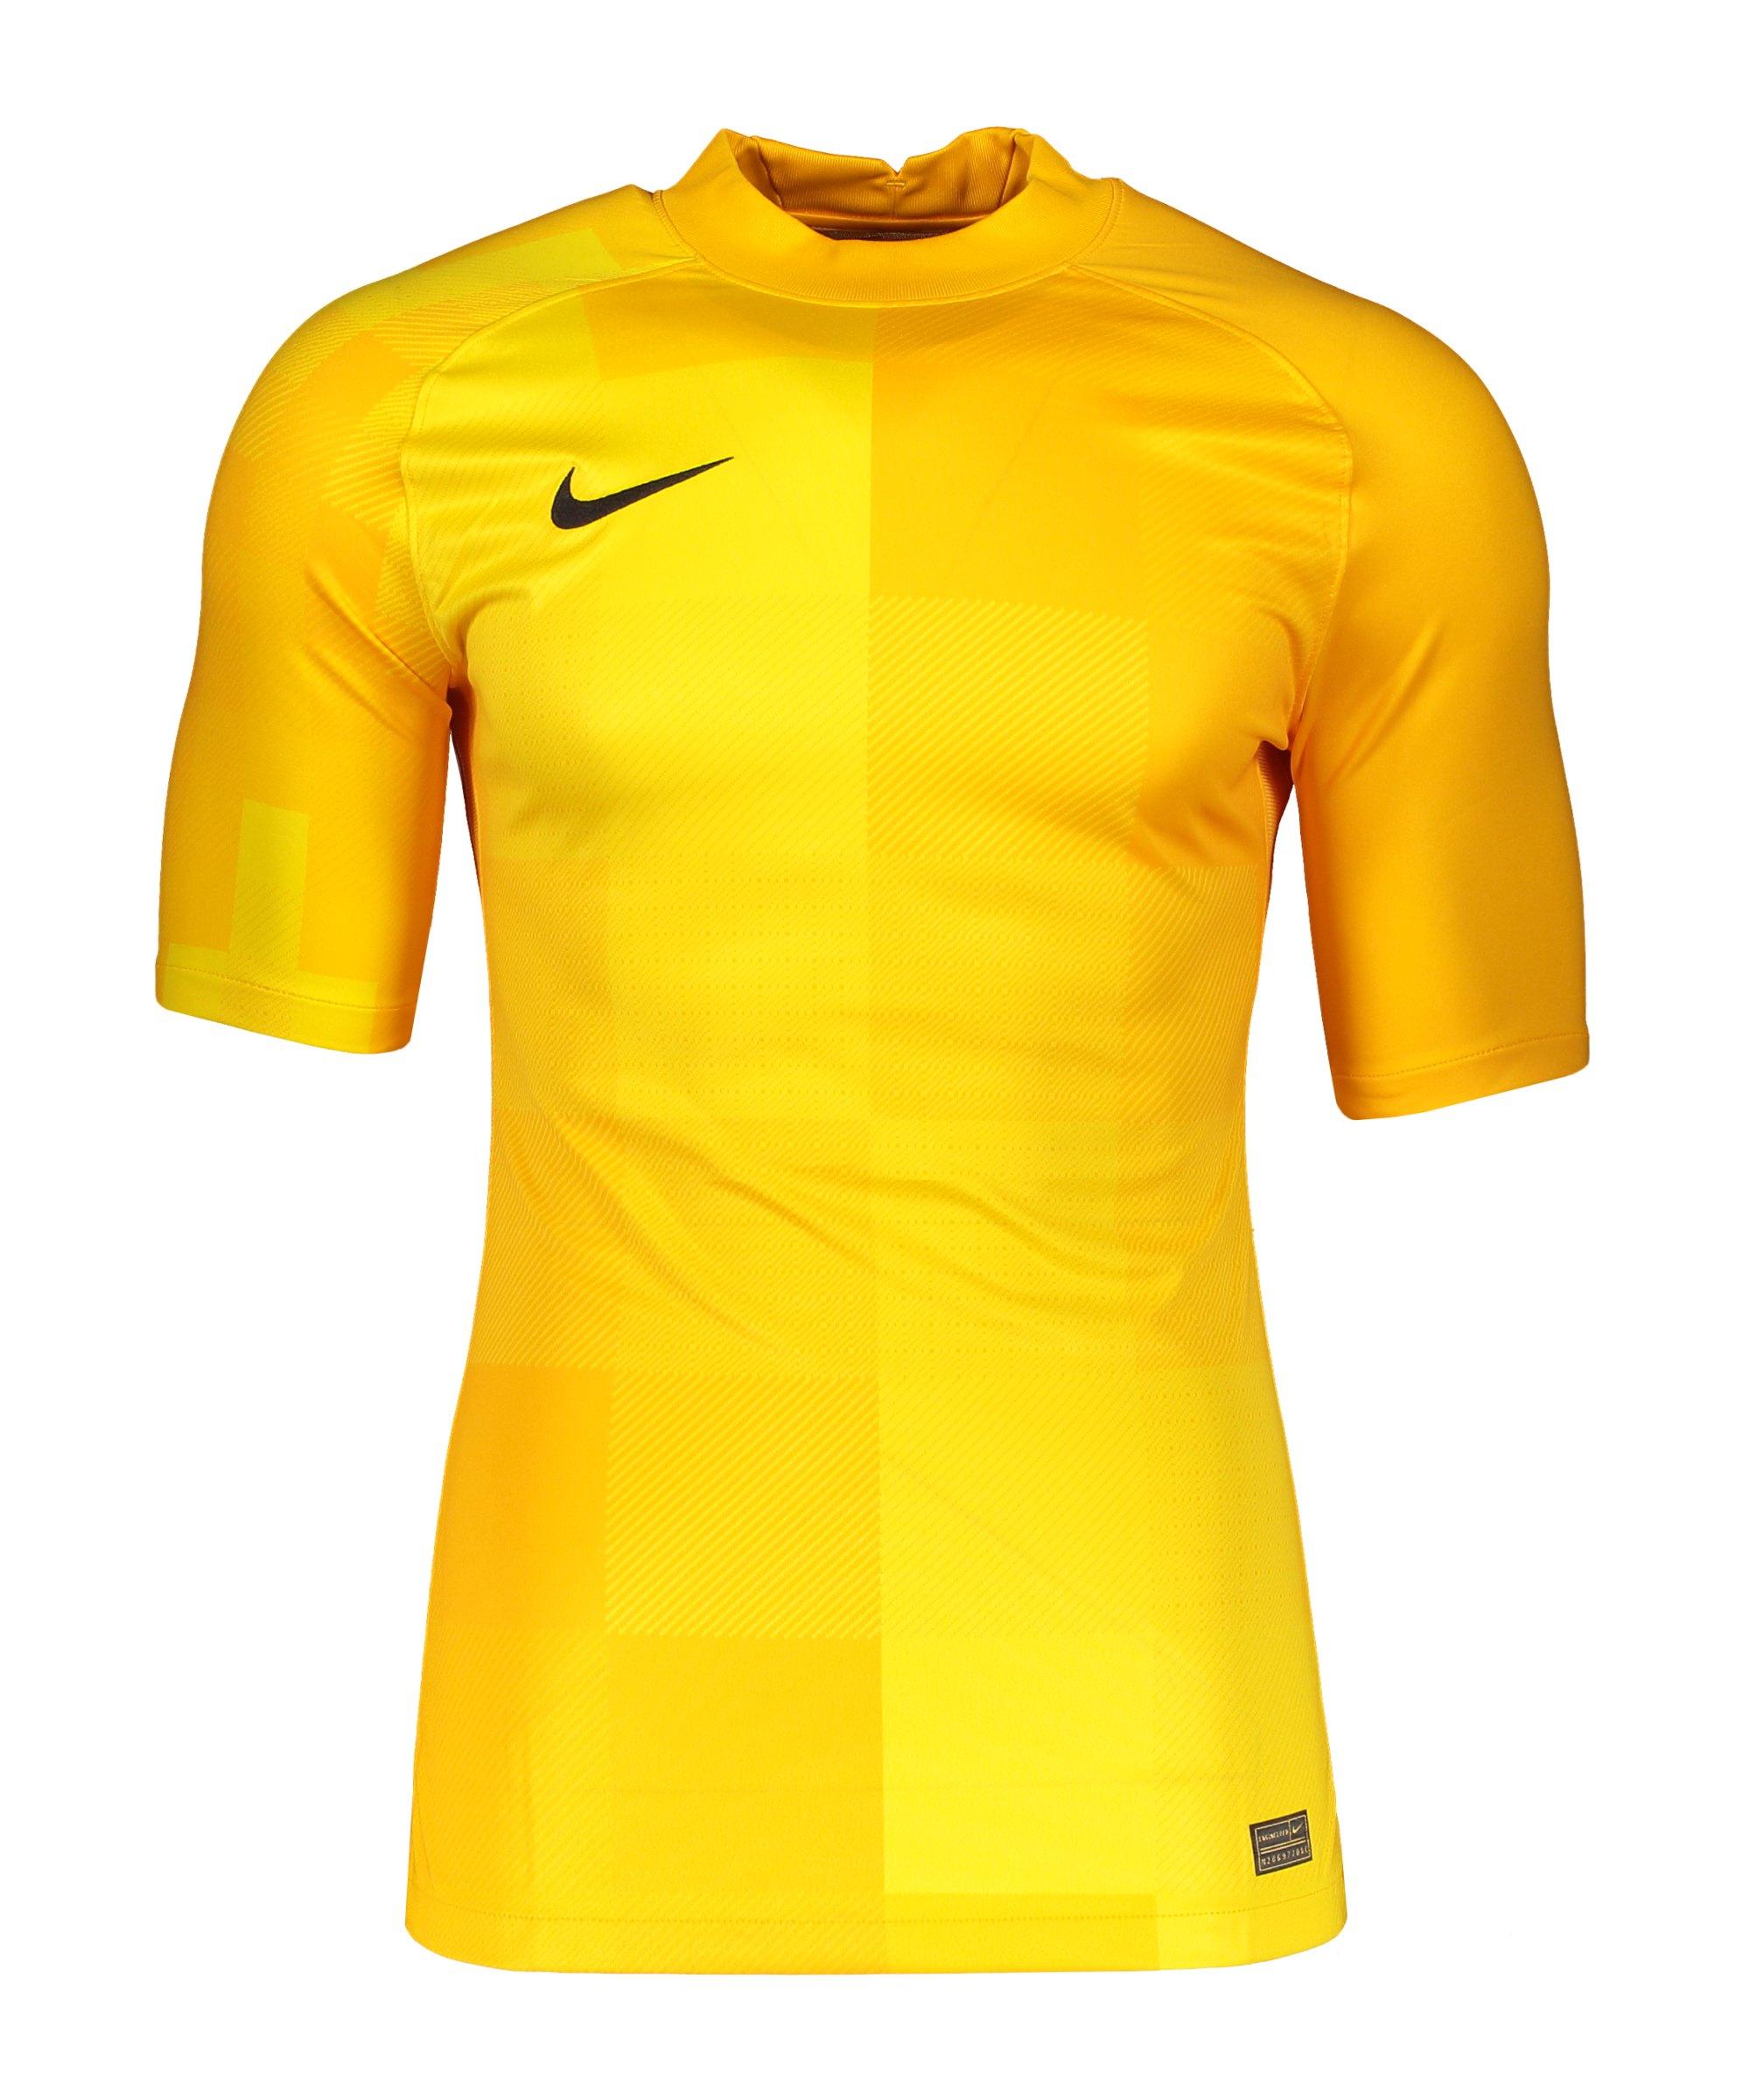 Nike Promo TW-Trikot kurzarm Gelb F739 - gelb